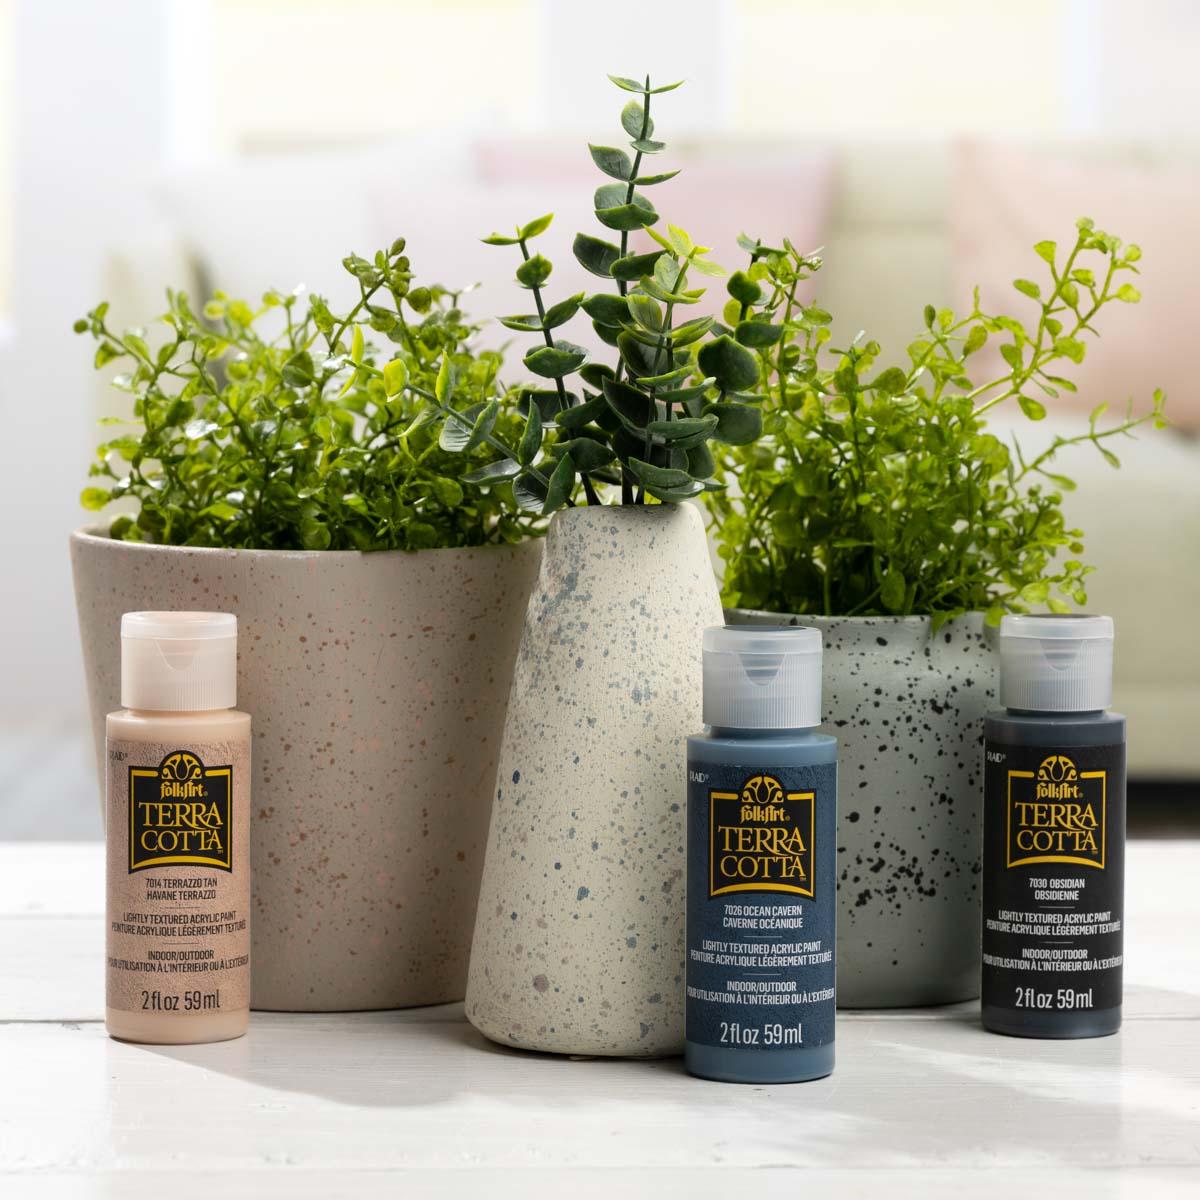 FolkArt ® Terra Cotta™ Acrylic Paint Set - Desert Chic, 5 pcs. - 44508